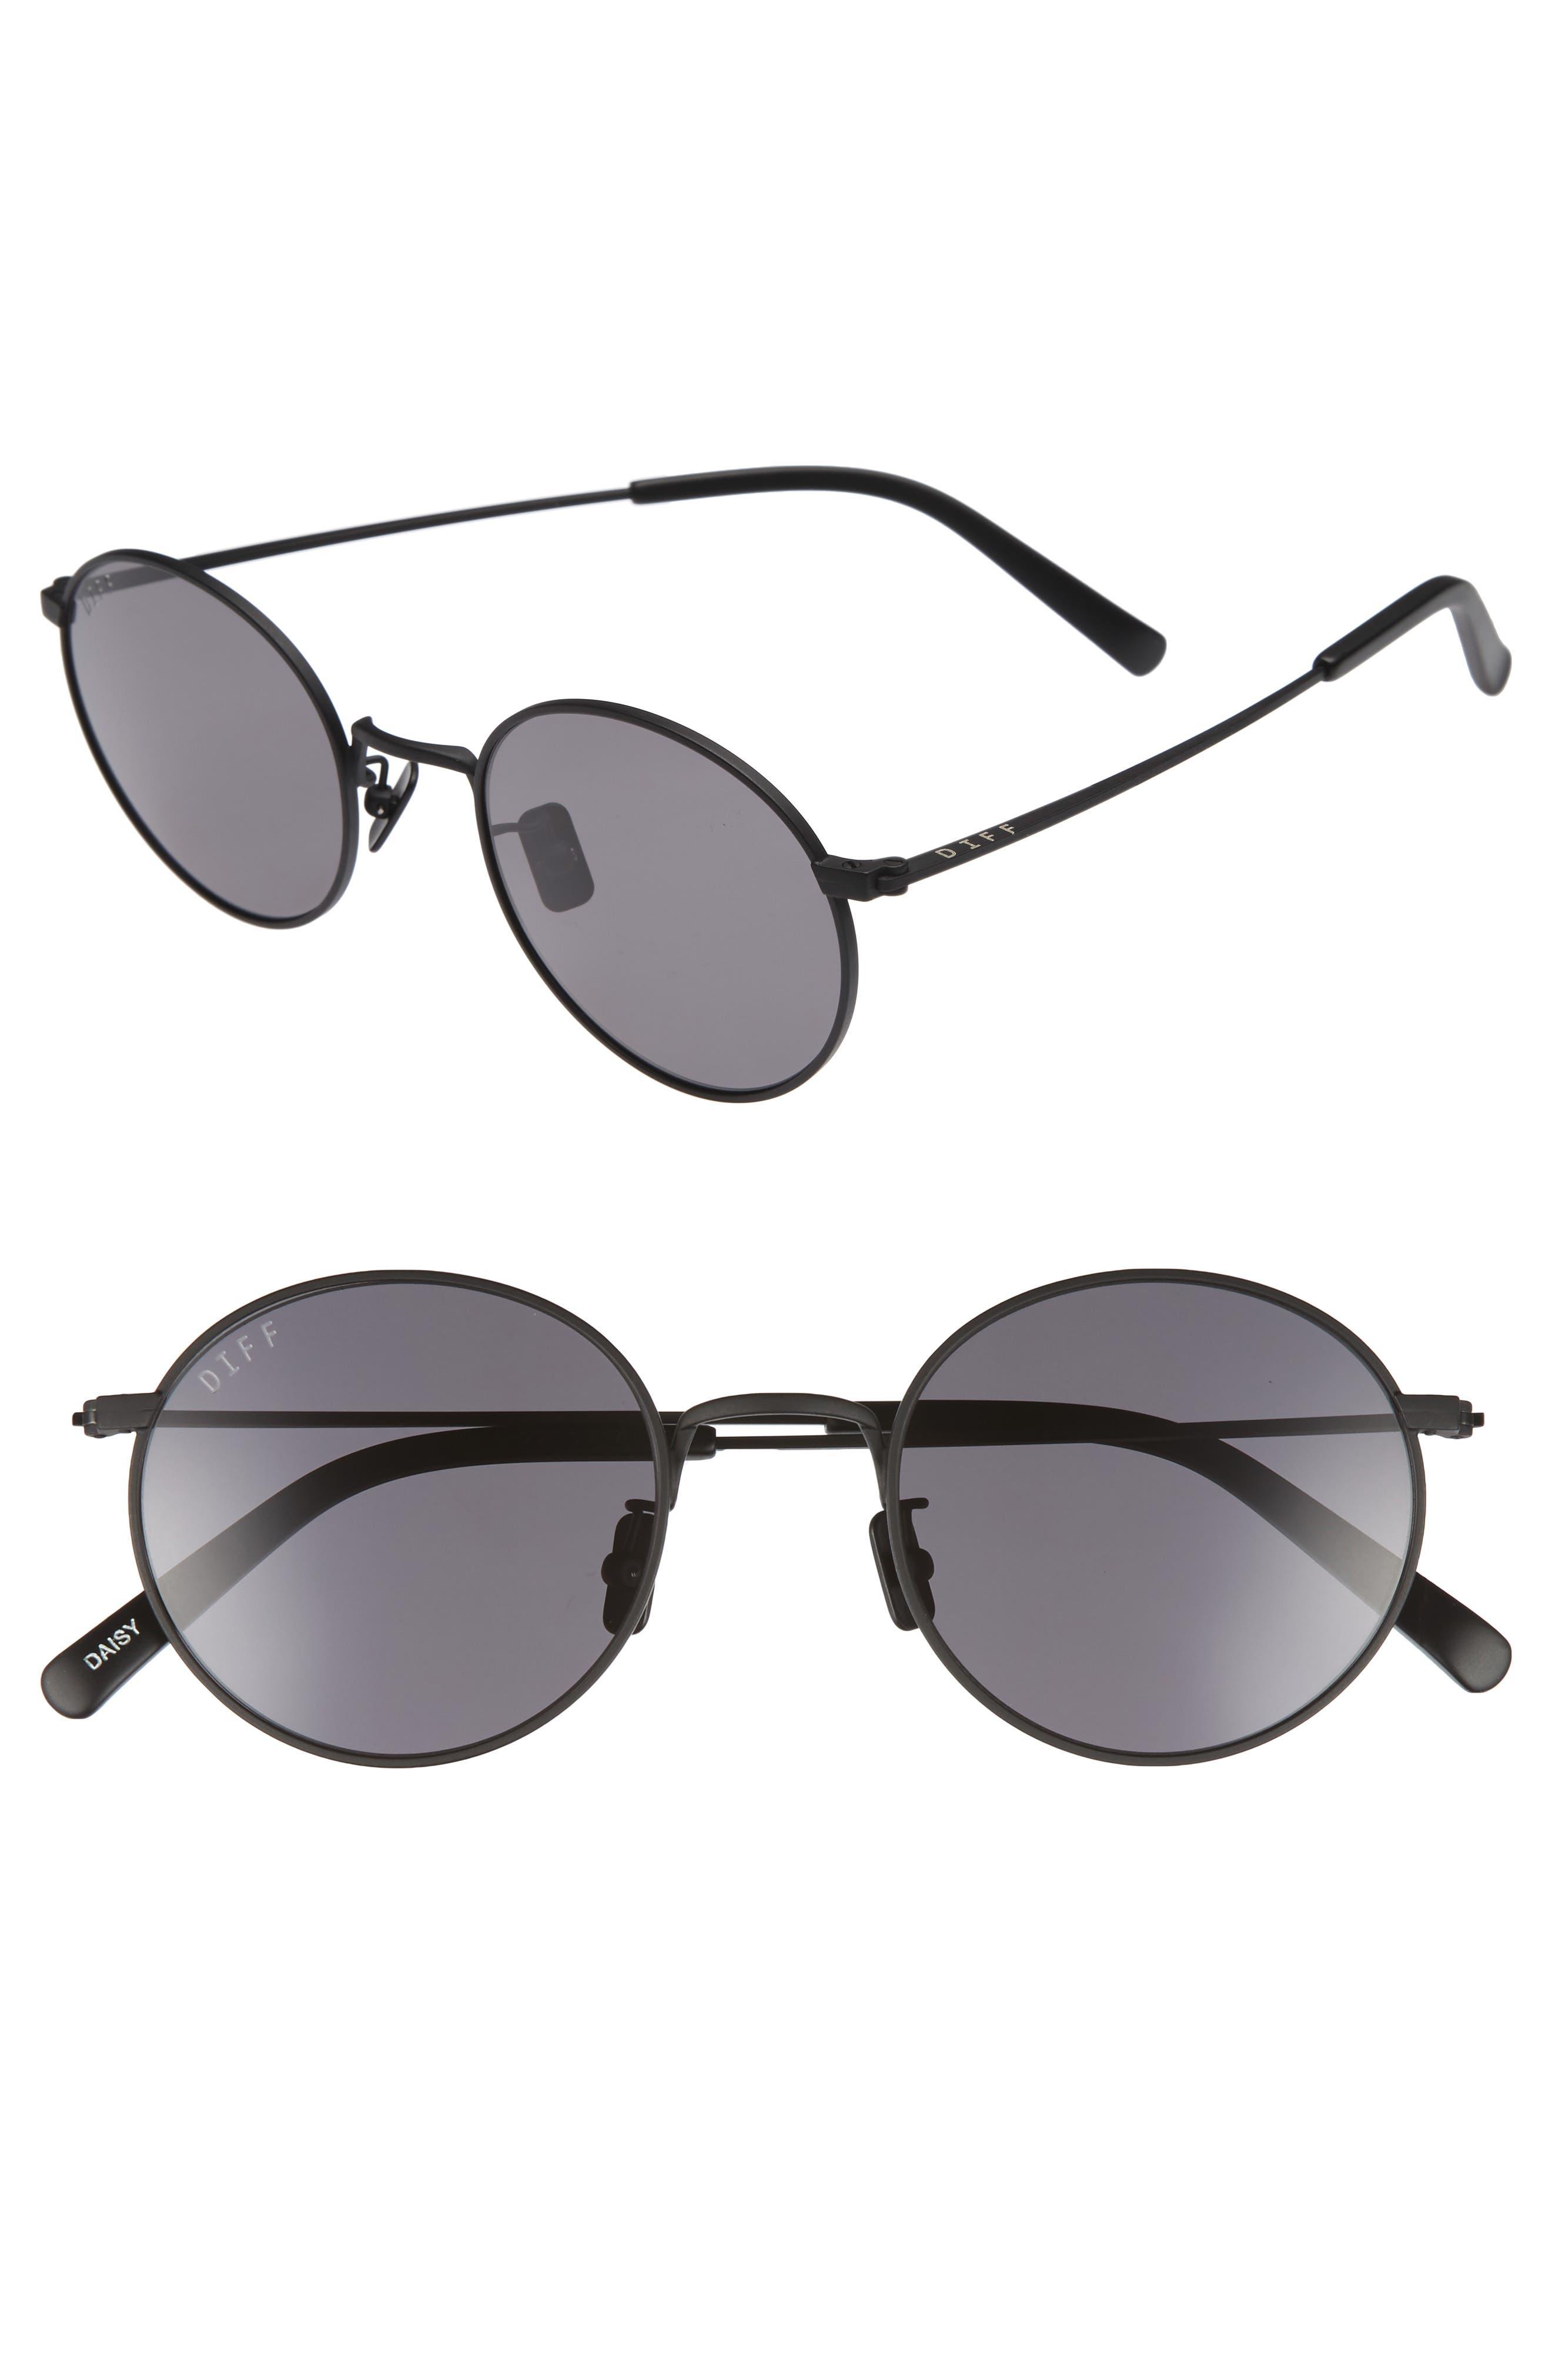 Daisy 51mm Round Sunglasses,                             Main thumbnail 1, color,                             Matte Black/ Grey